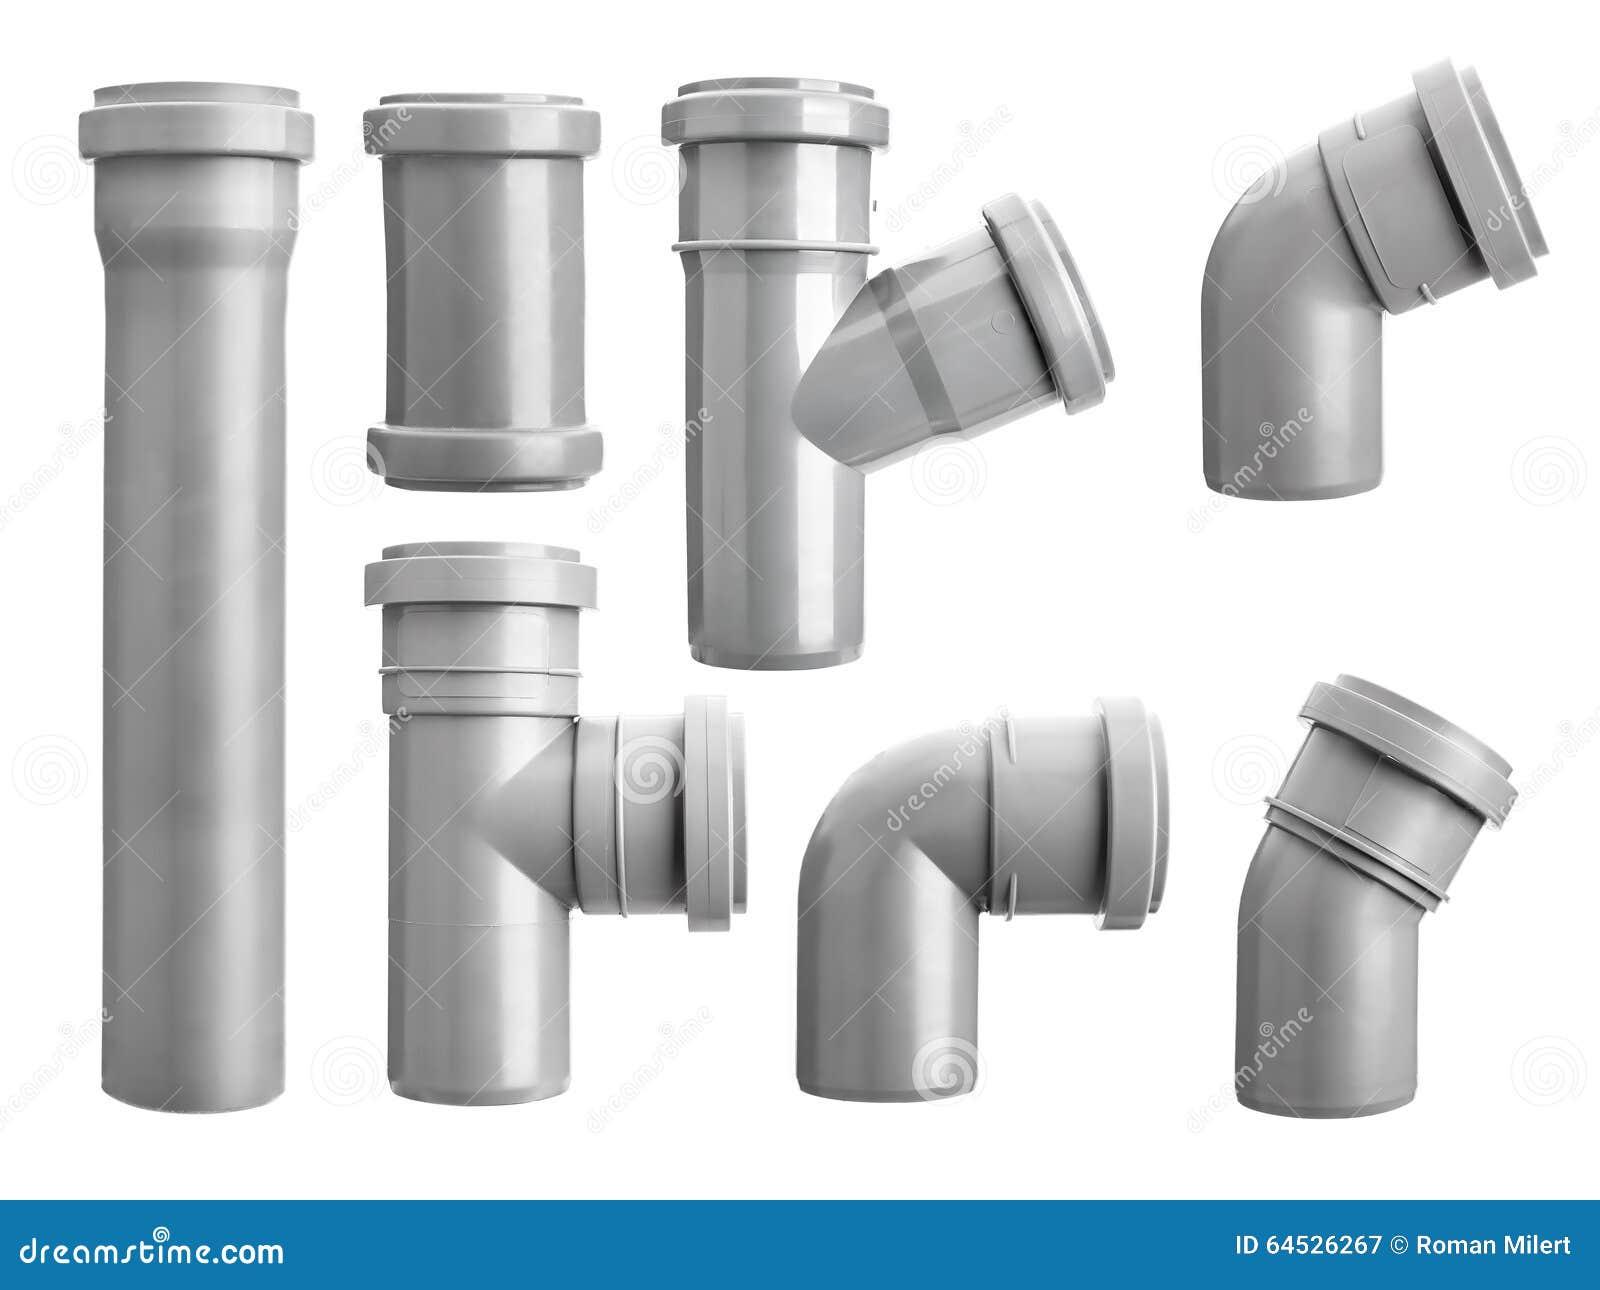 PVC Sewage Pipe Fittings Stock Image. Image Of Gray, Sewer